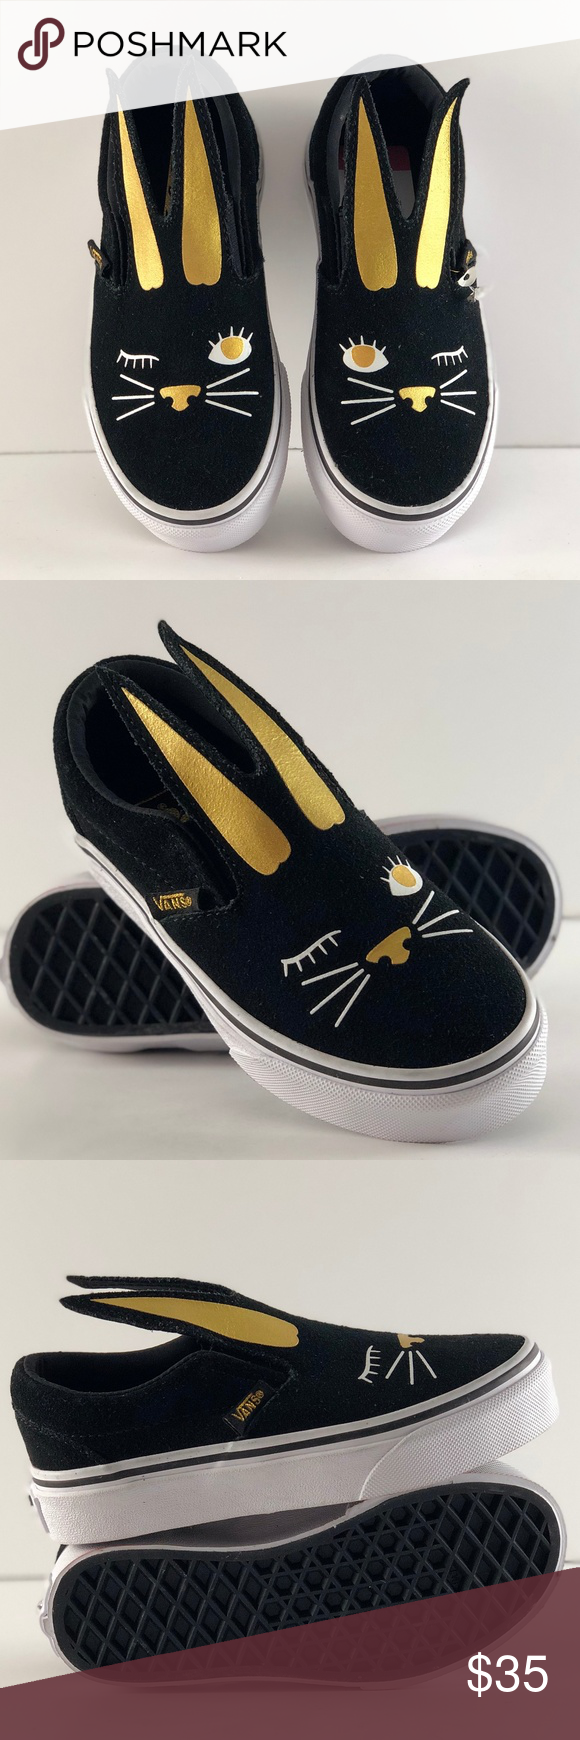 56ae7de5f Vans SLIP ON Bunny Black Gold Toddler Shoes NWT